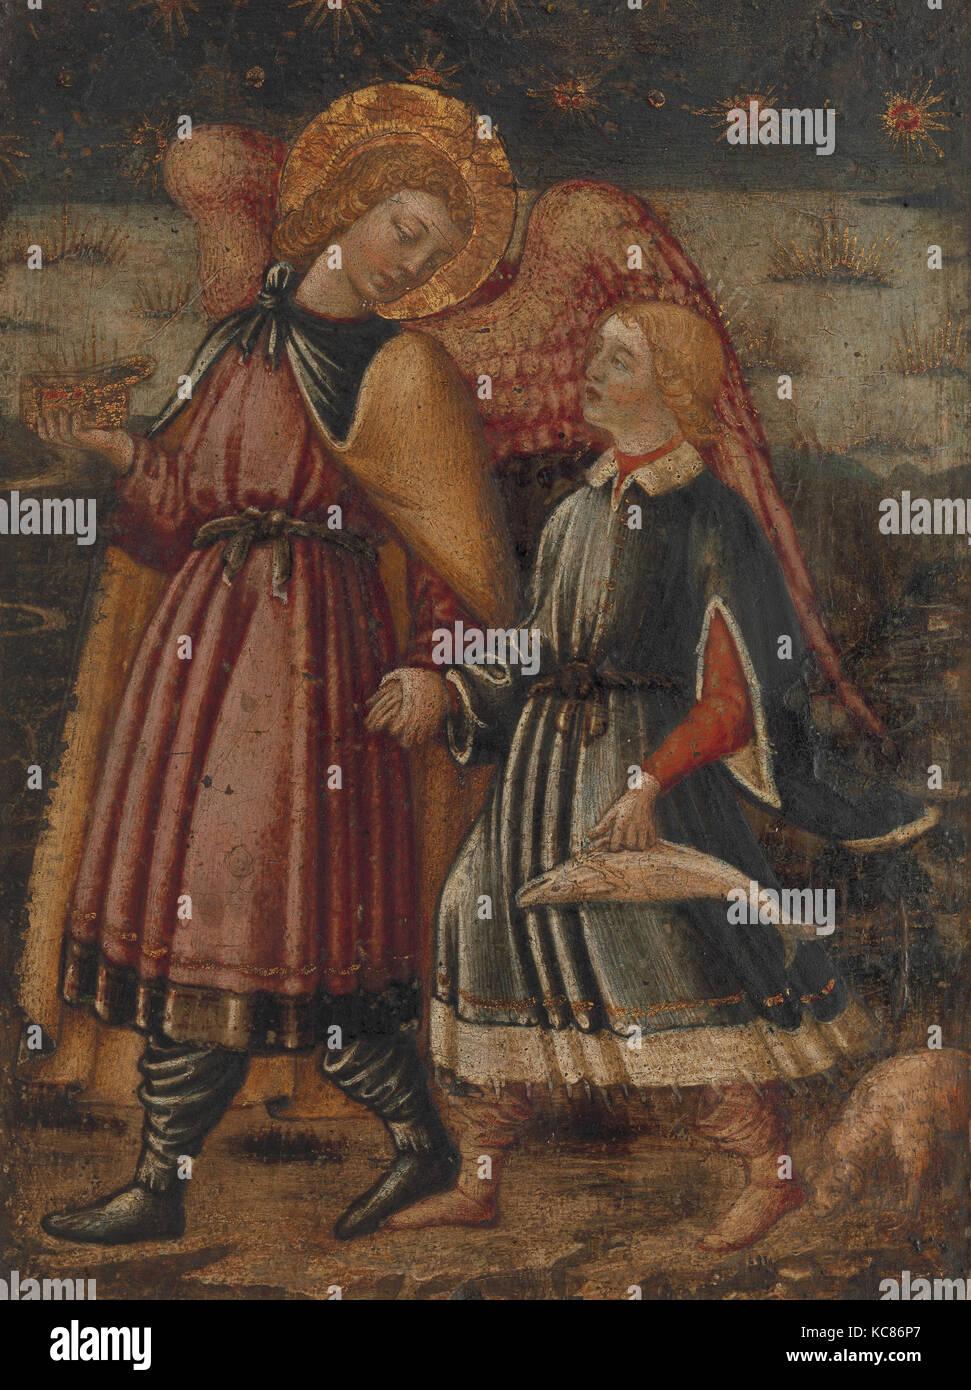 Raphael and tobias story